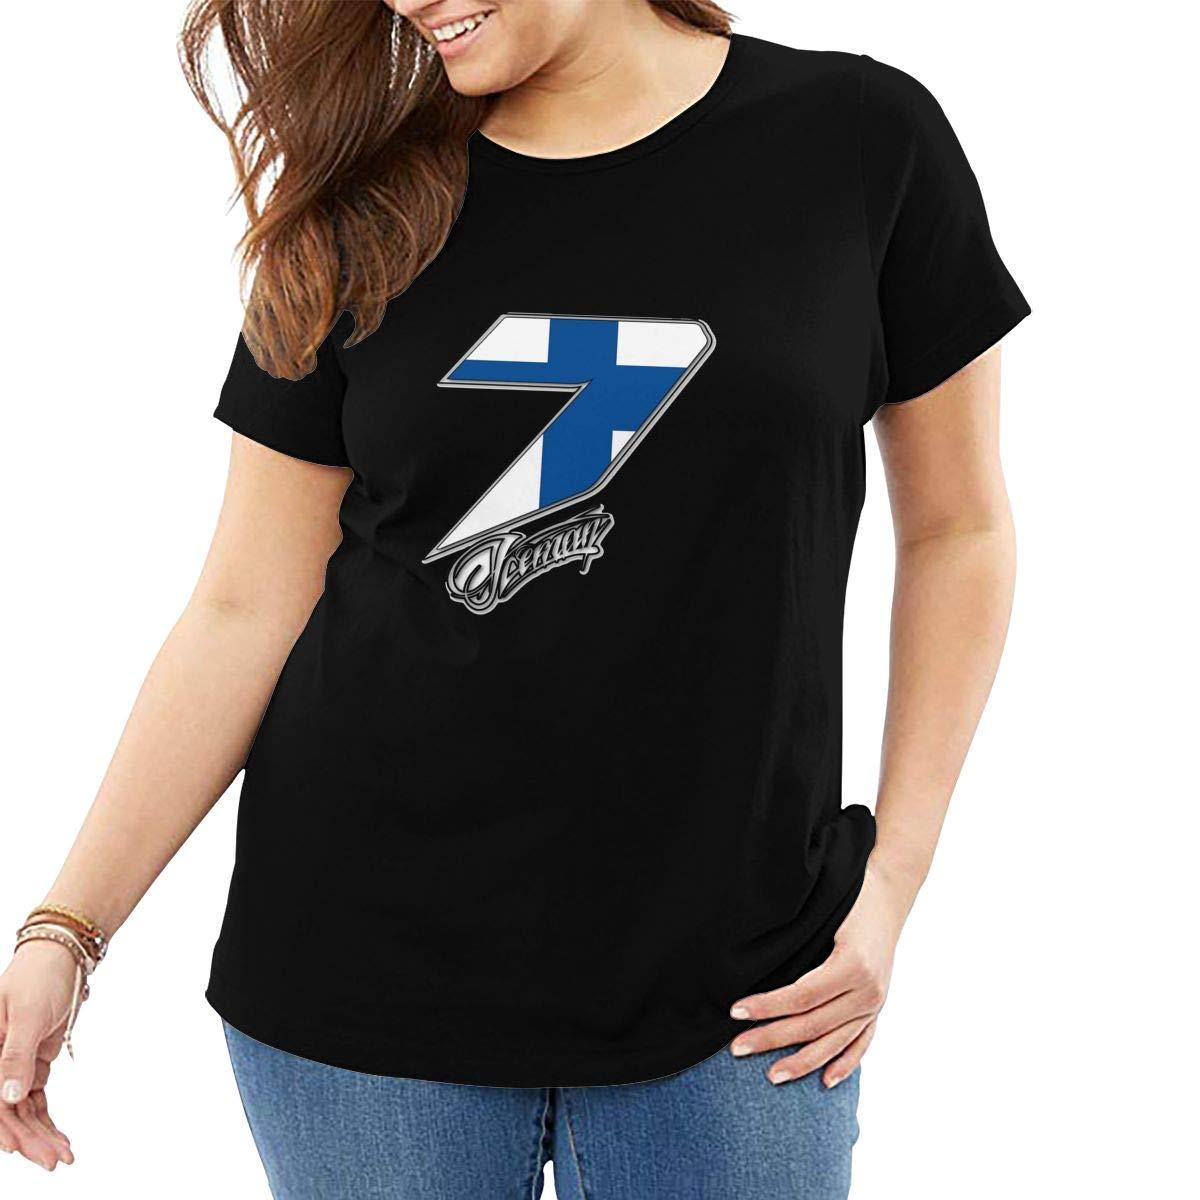 Kimi R Ikk Nen 7 Plus Big T Shirt For Fat